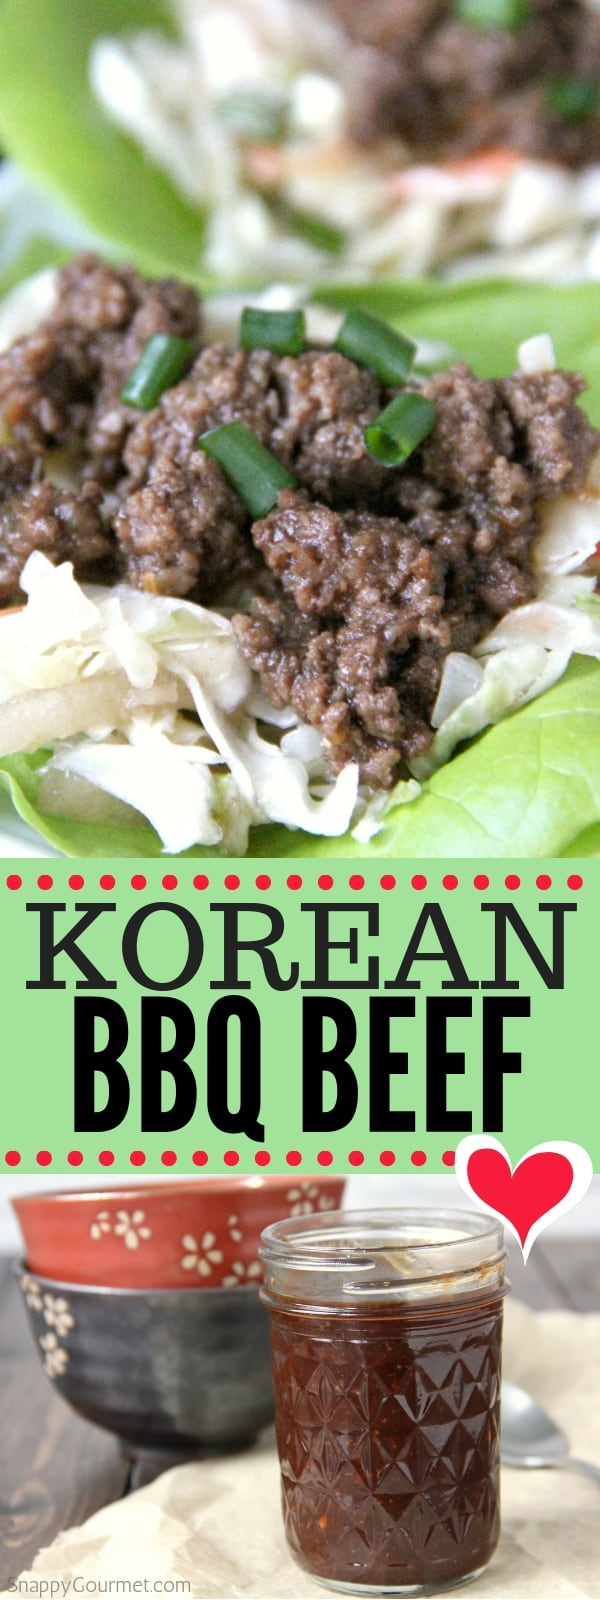 Korean BBQ Beef collage